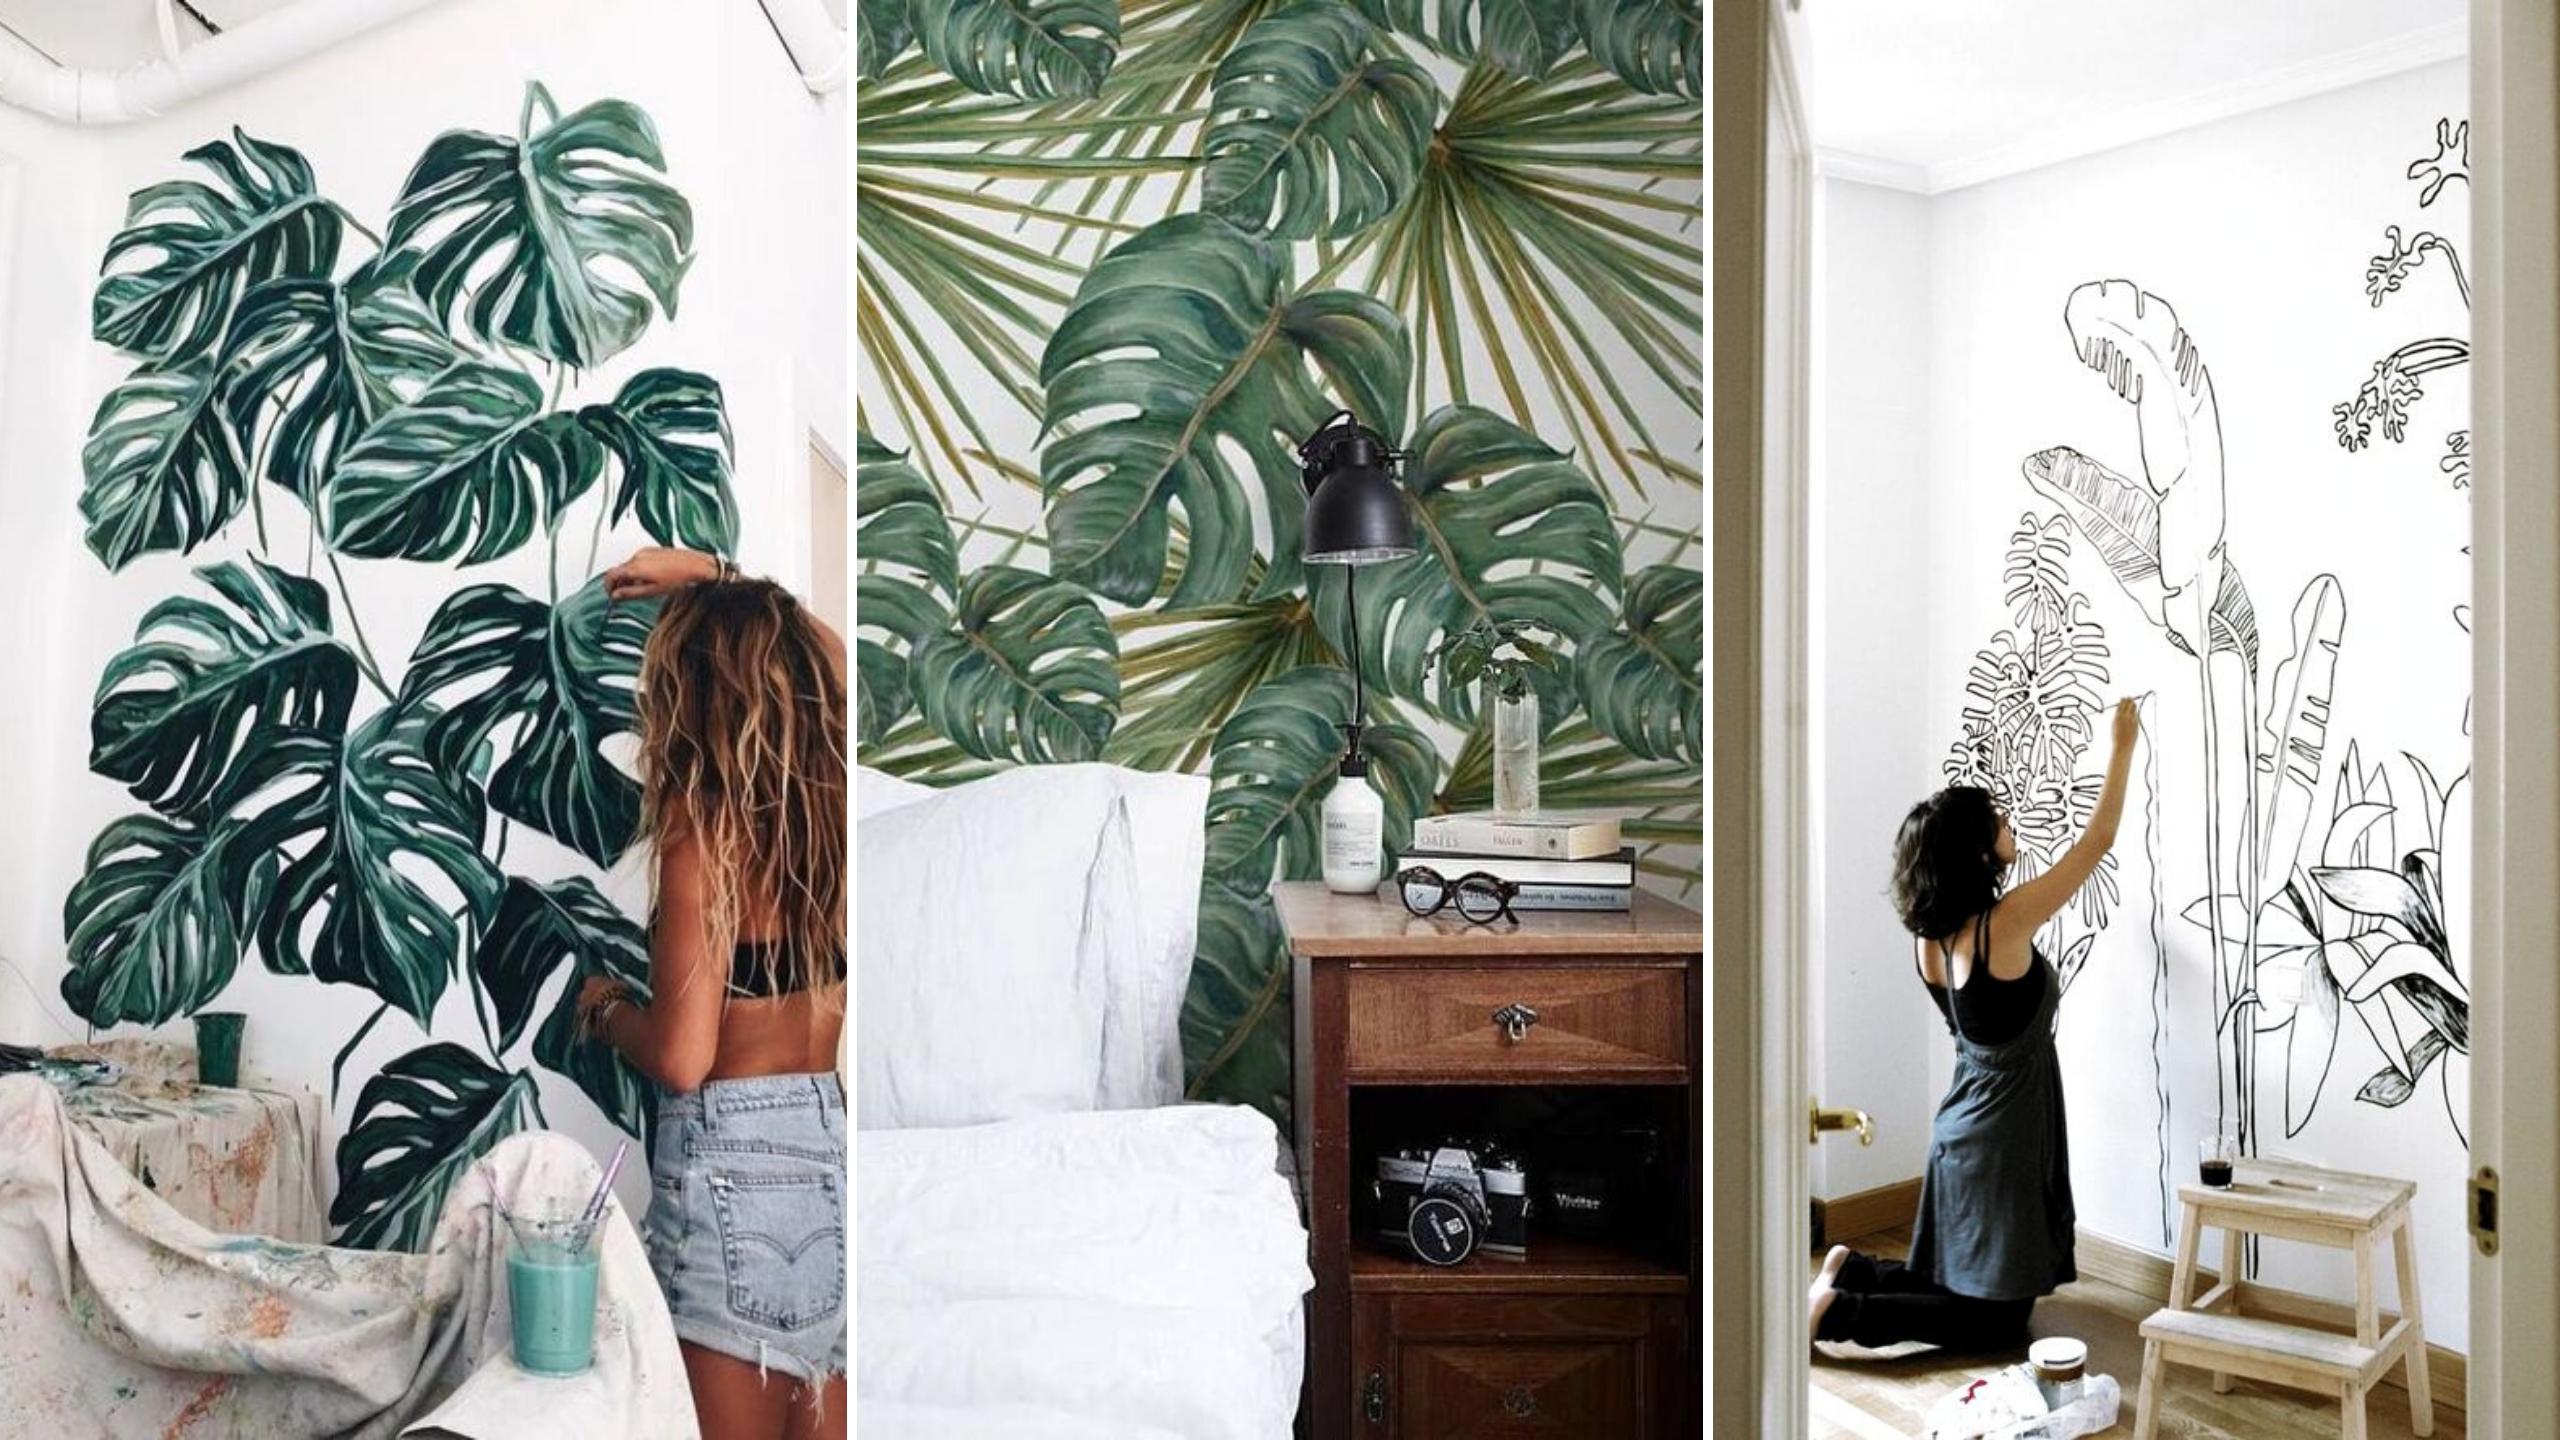 creer jardin interieur peinture fresque murale plantes